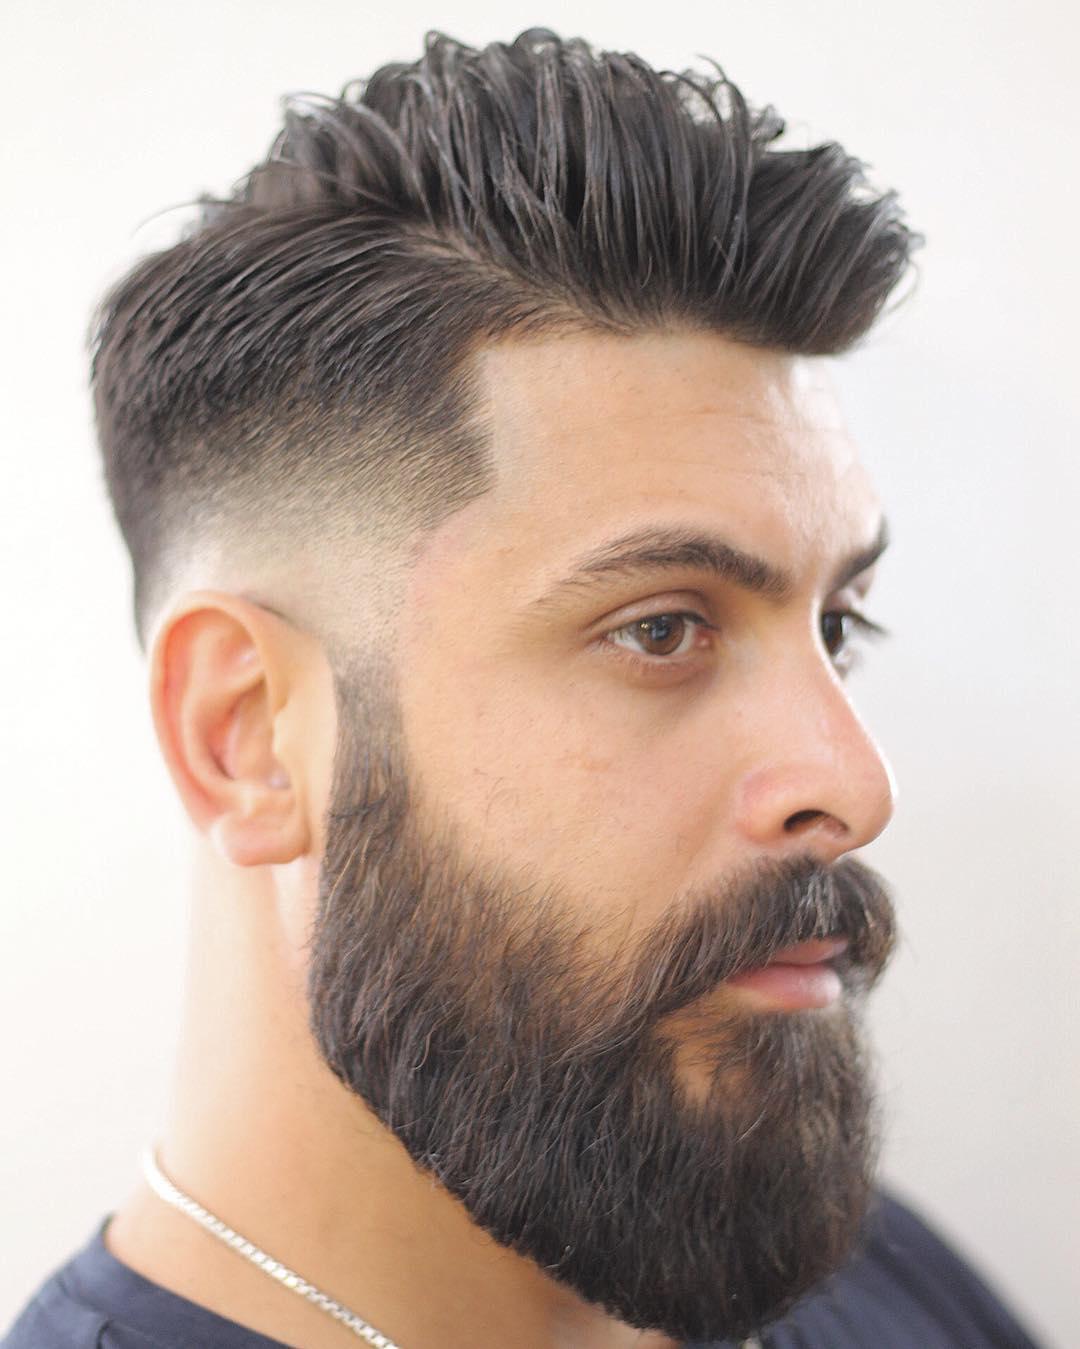 faded-hair-style-with-fuller-beard